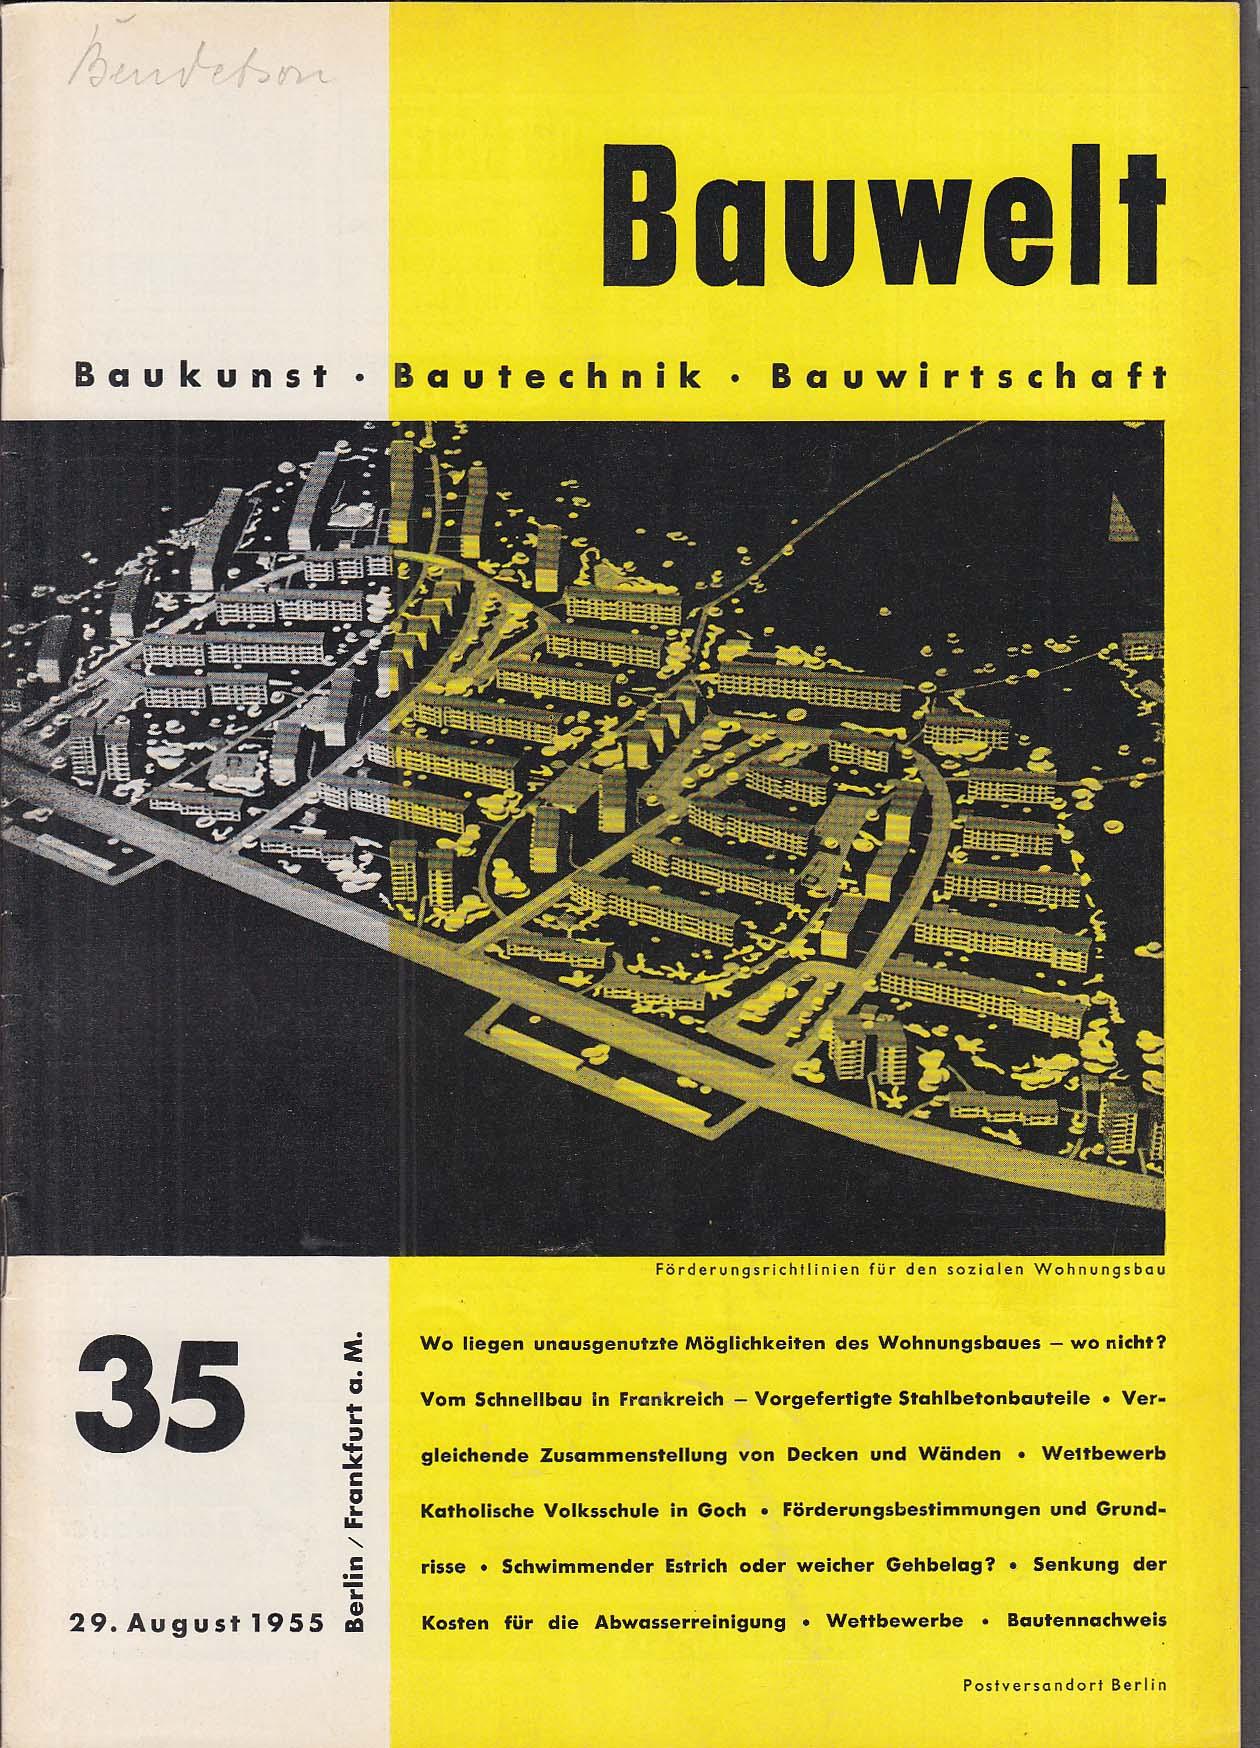 Bauwelt German architecture magazine 8/29/1955